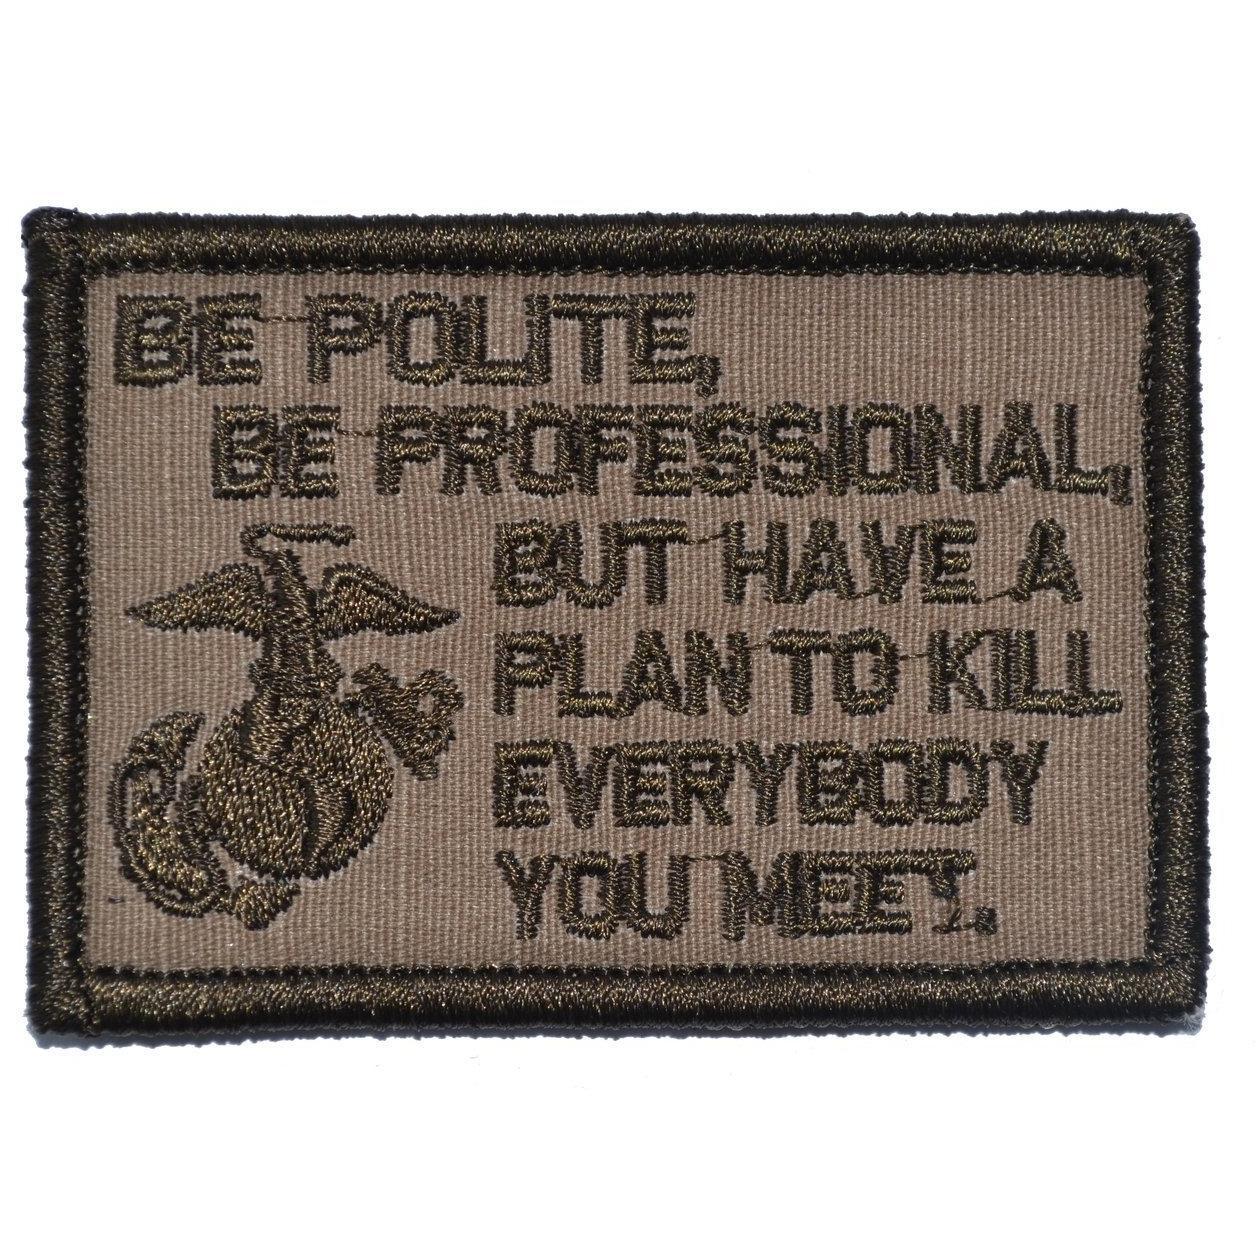 Be Polite, Be Professional USMC Mattis Quote - 2x3 Patch